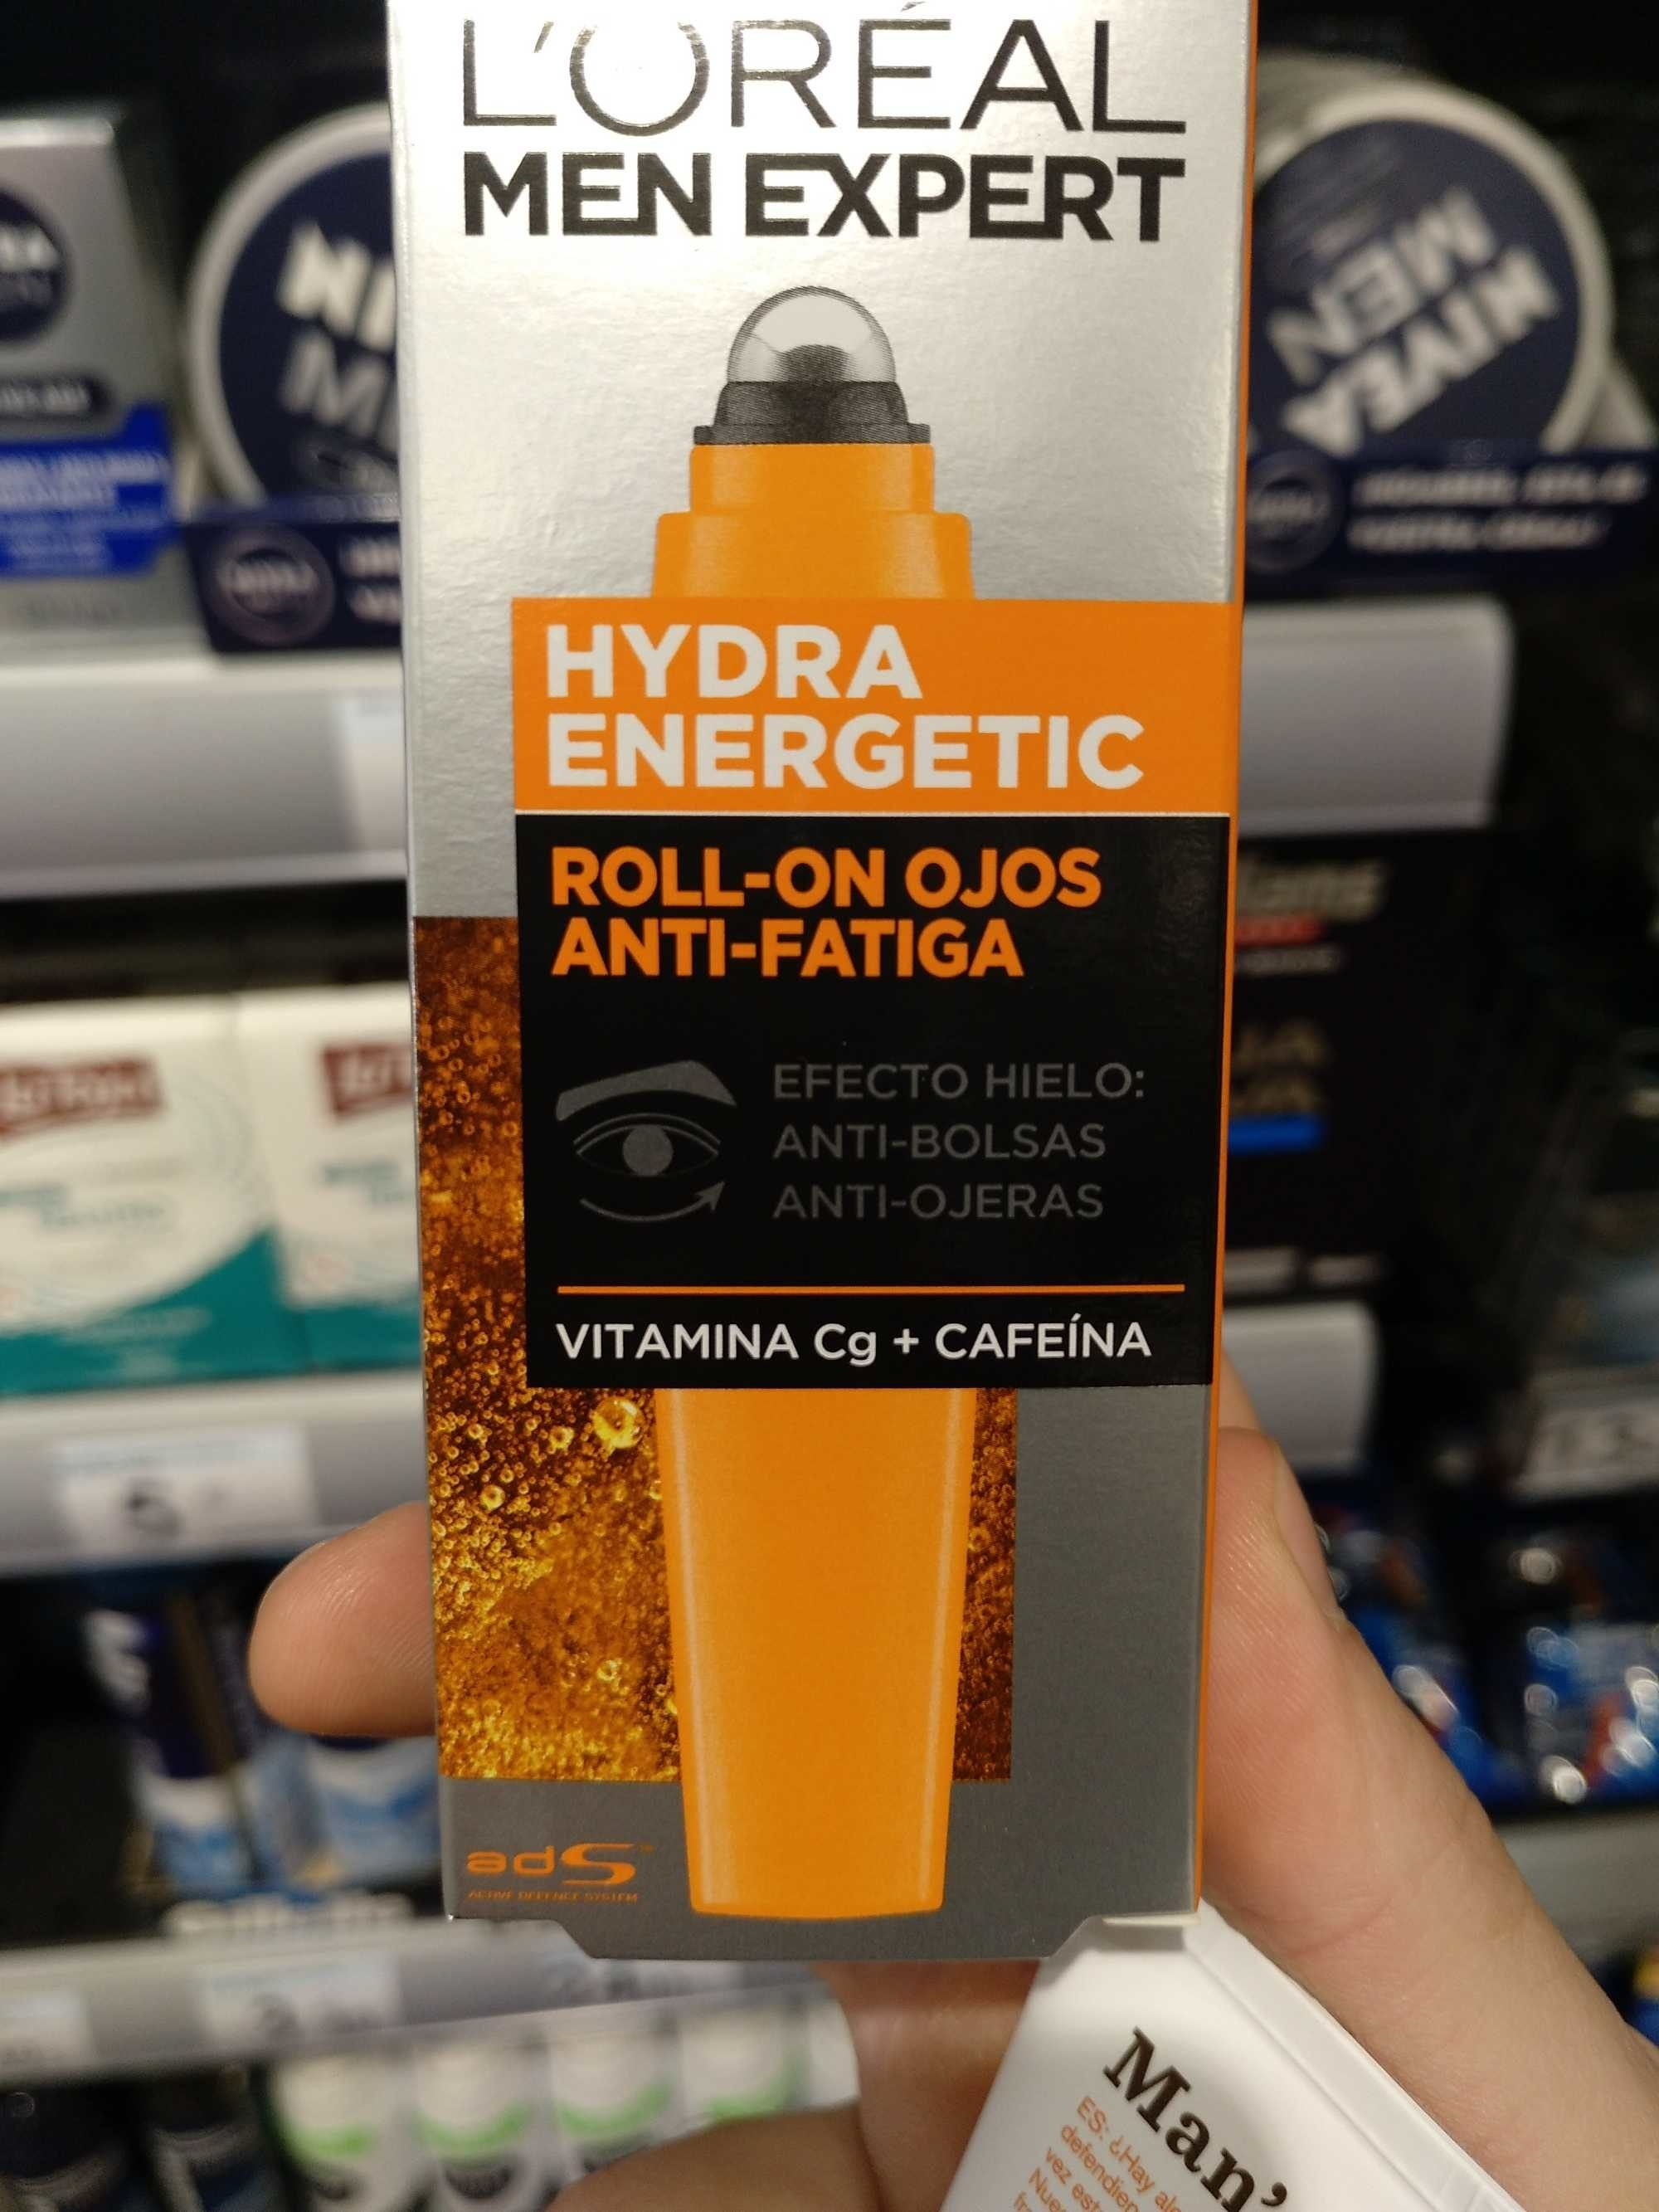 Hydra Energetic Roll-On Ojos Anti-Fatiga - Product